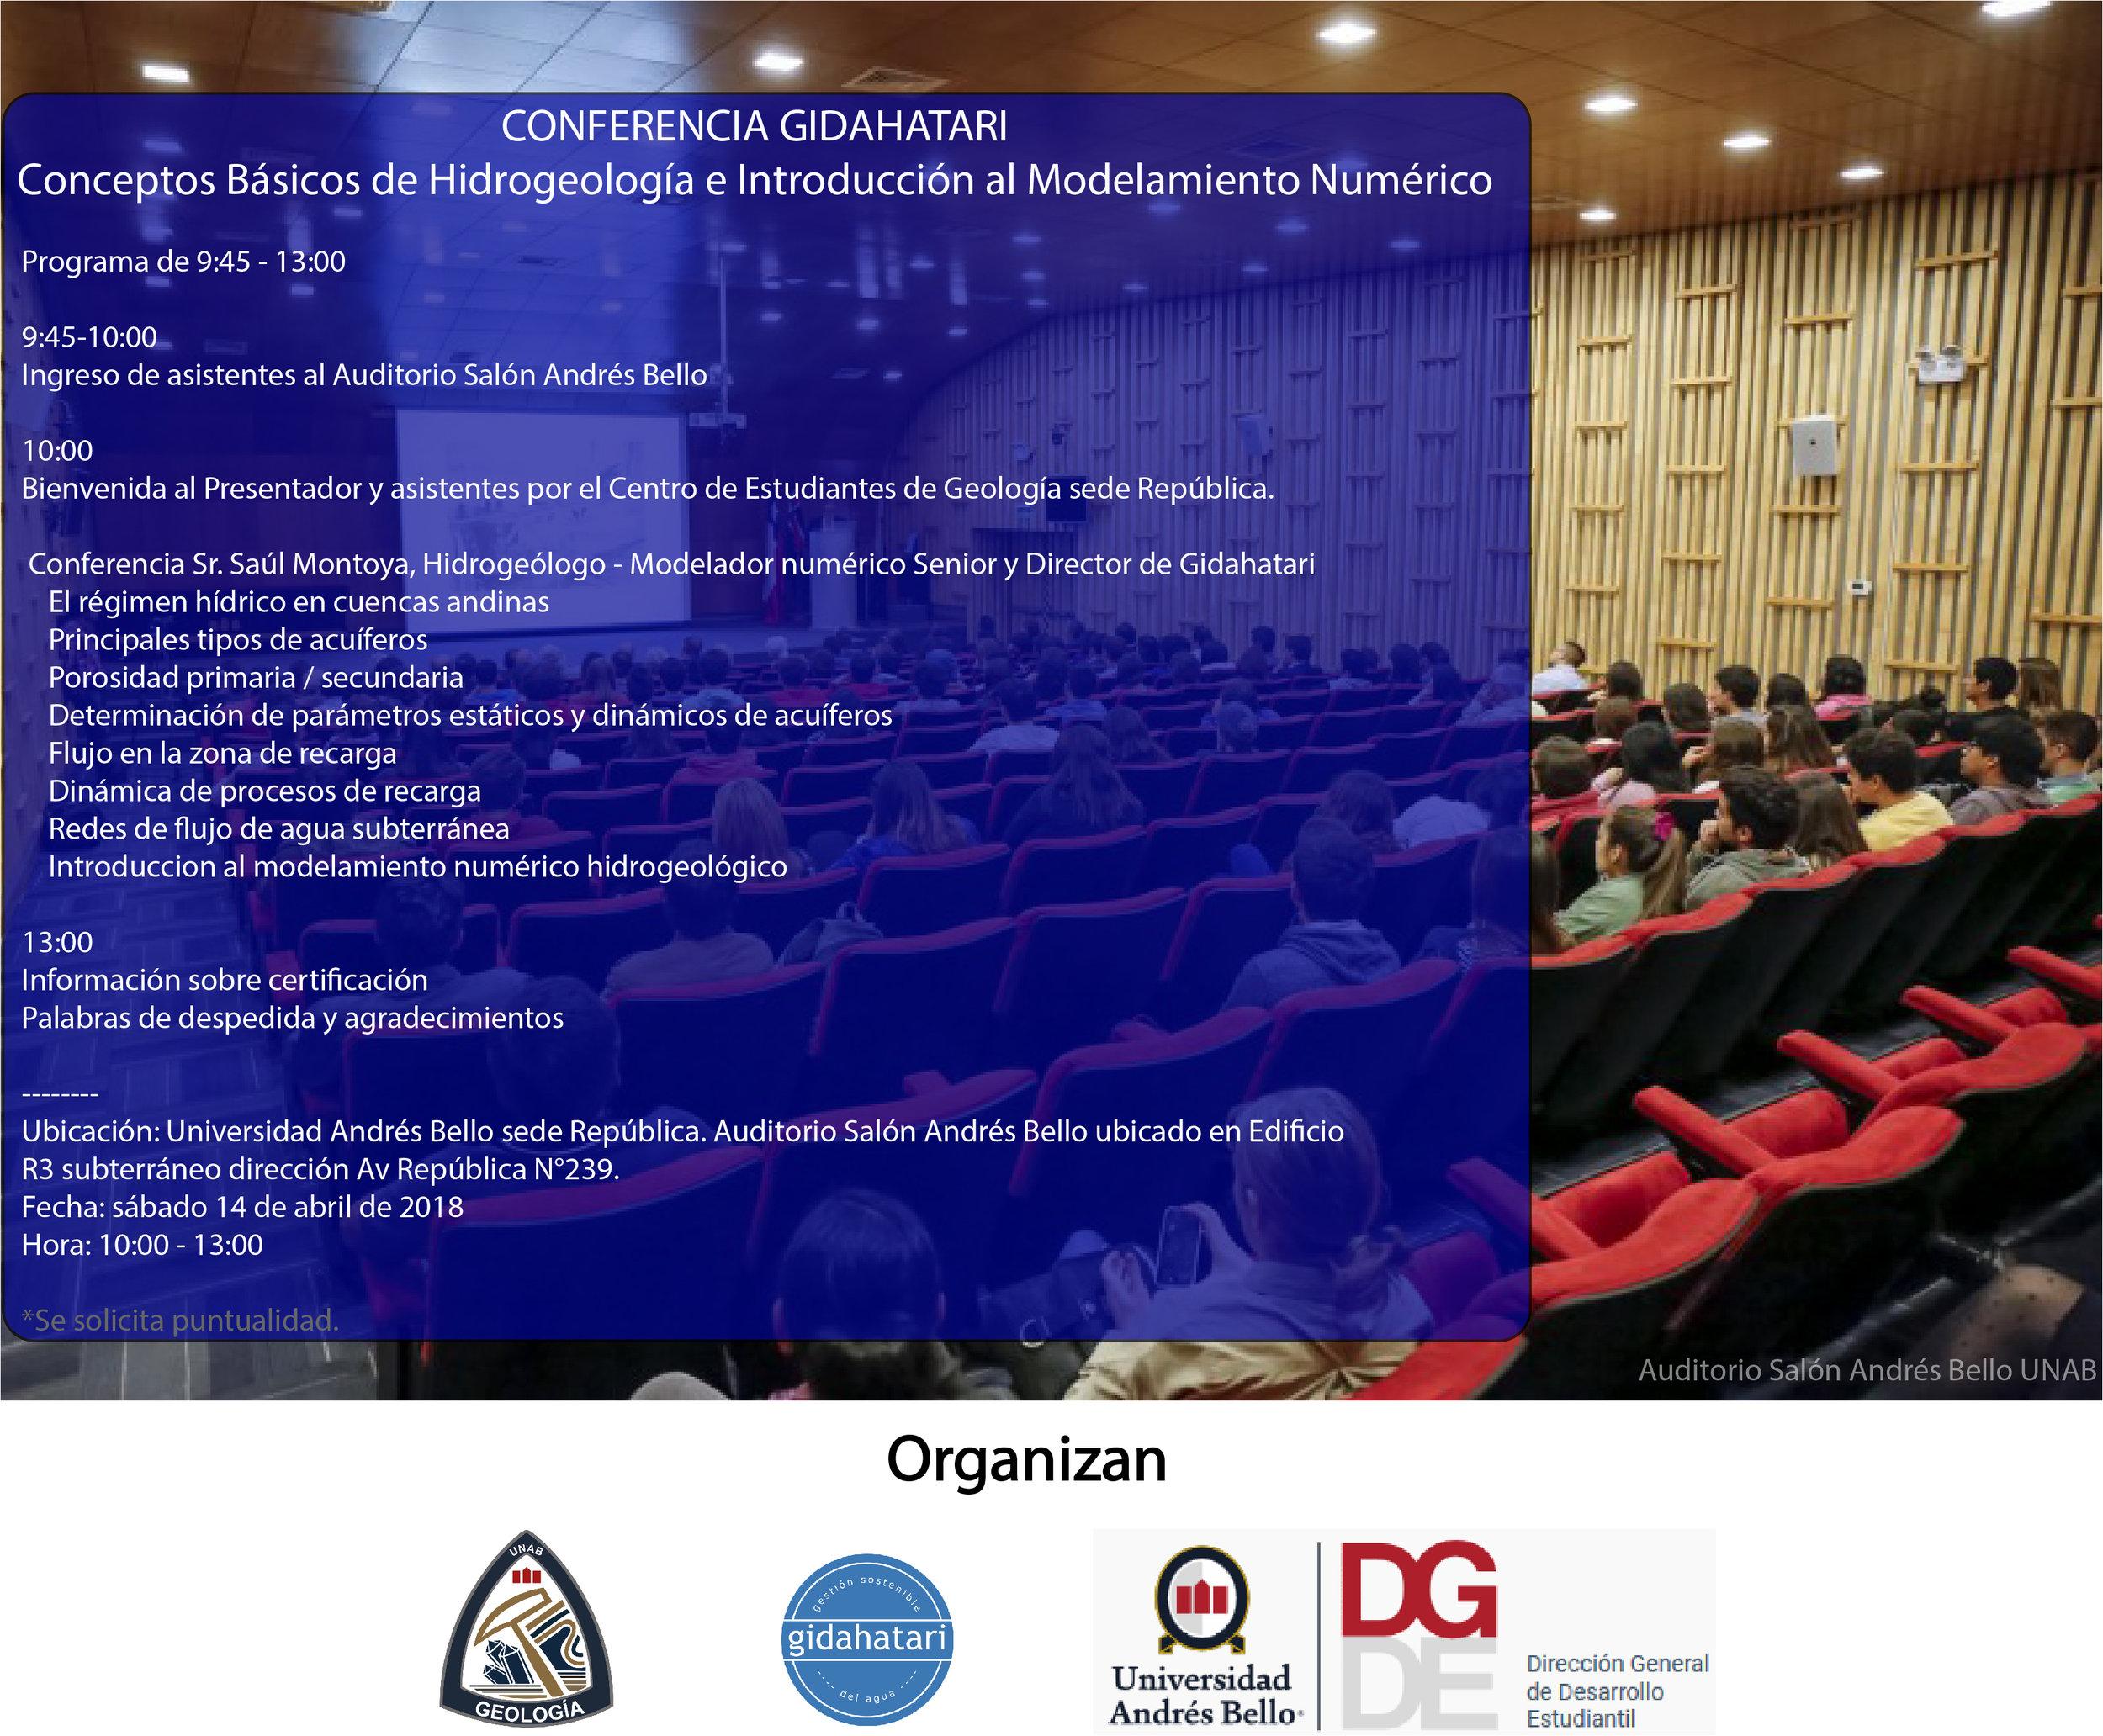 Conferencia gidahatari programa.jpg